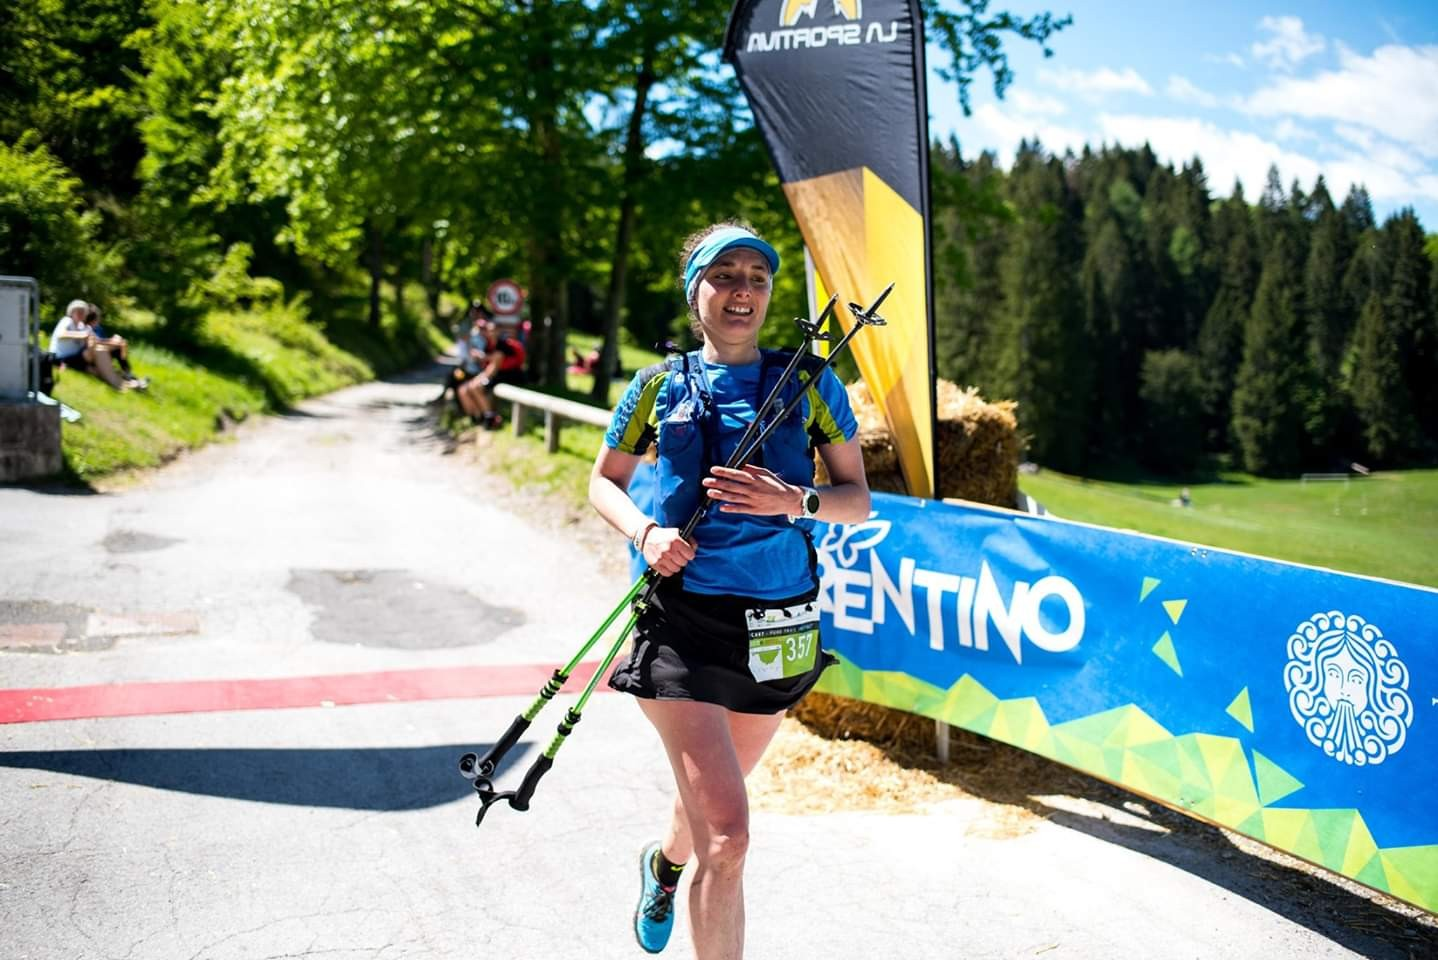 Novità – Trail Running GAP- Presentata Squadra di Corsa in Montagna